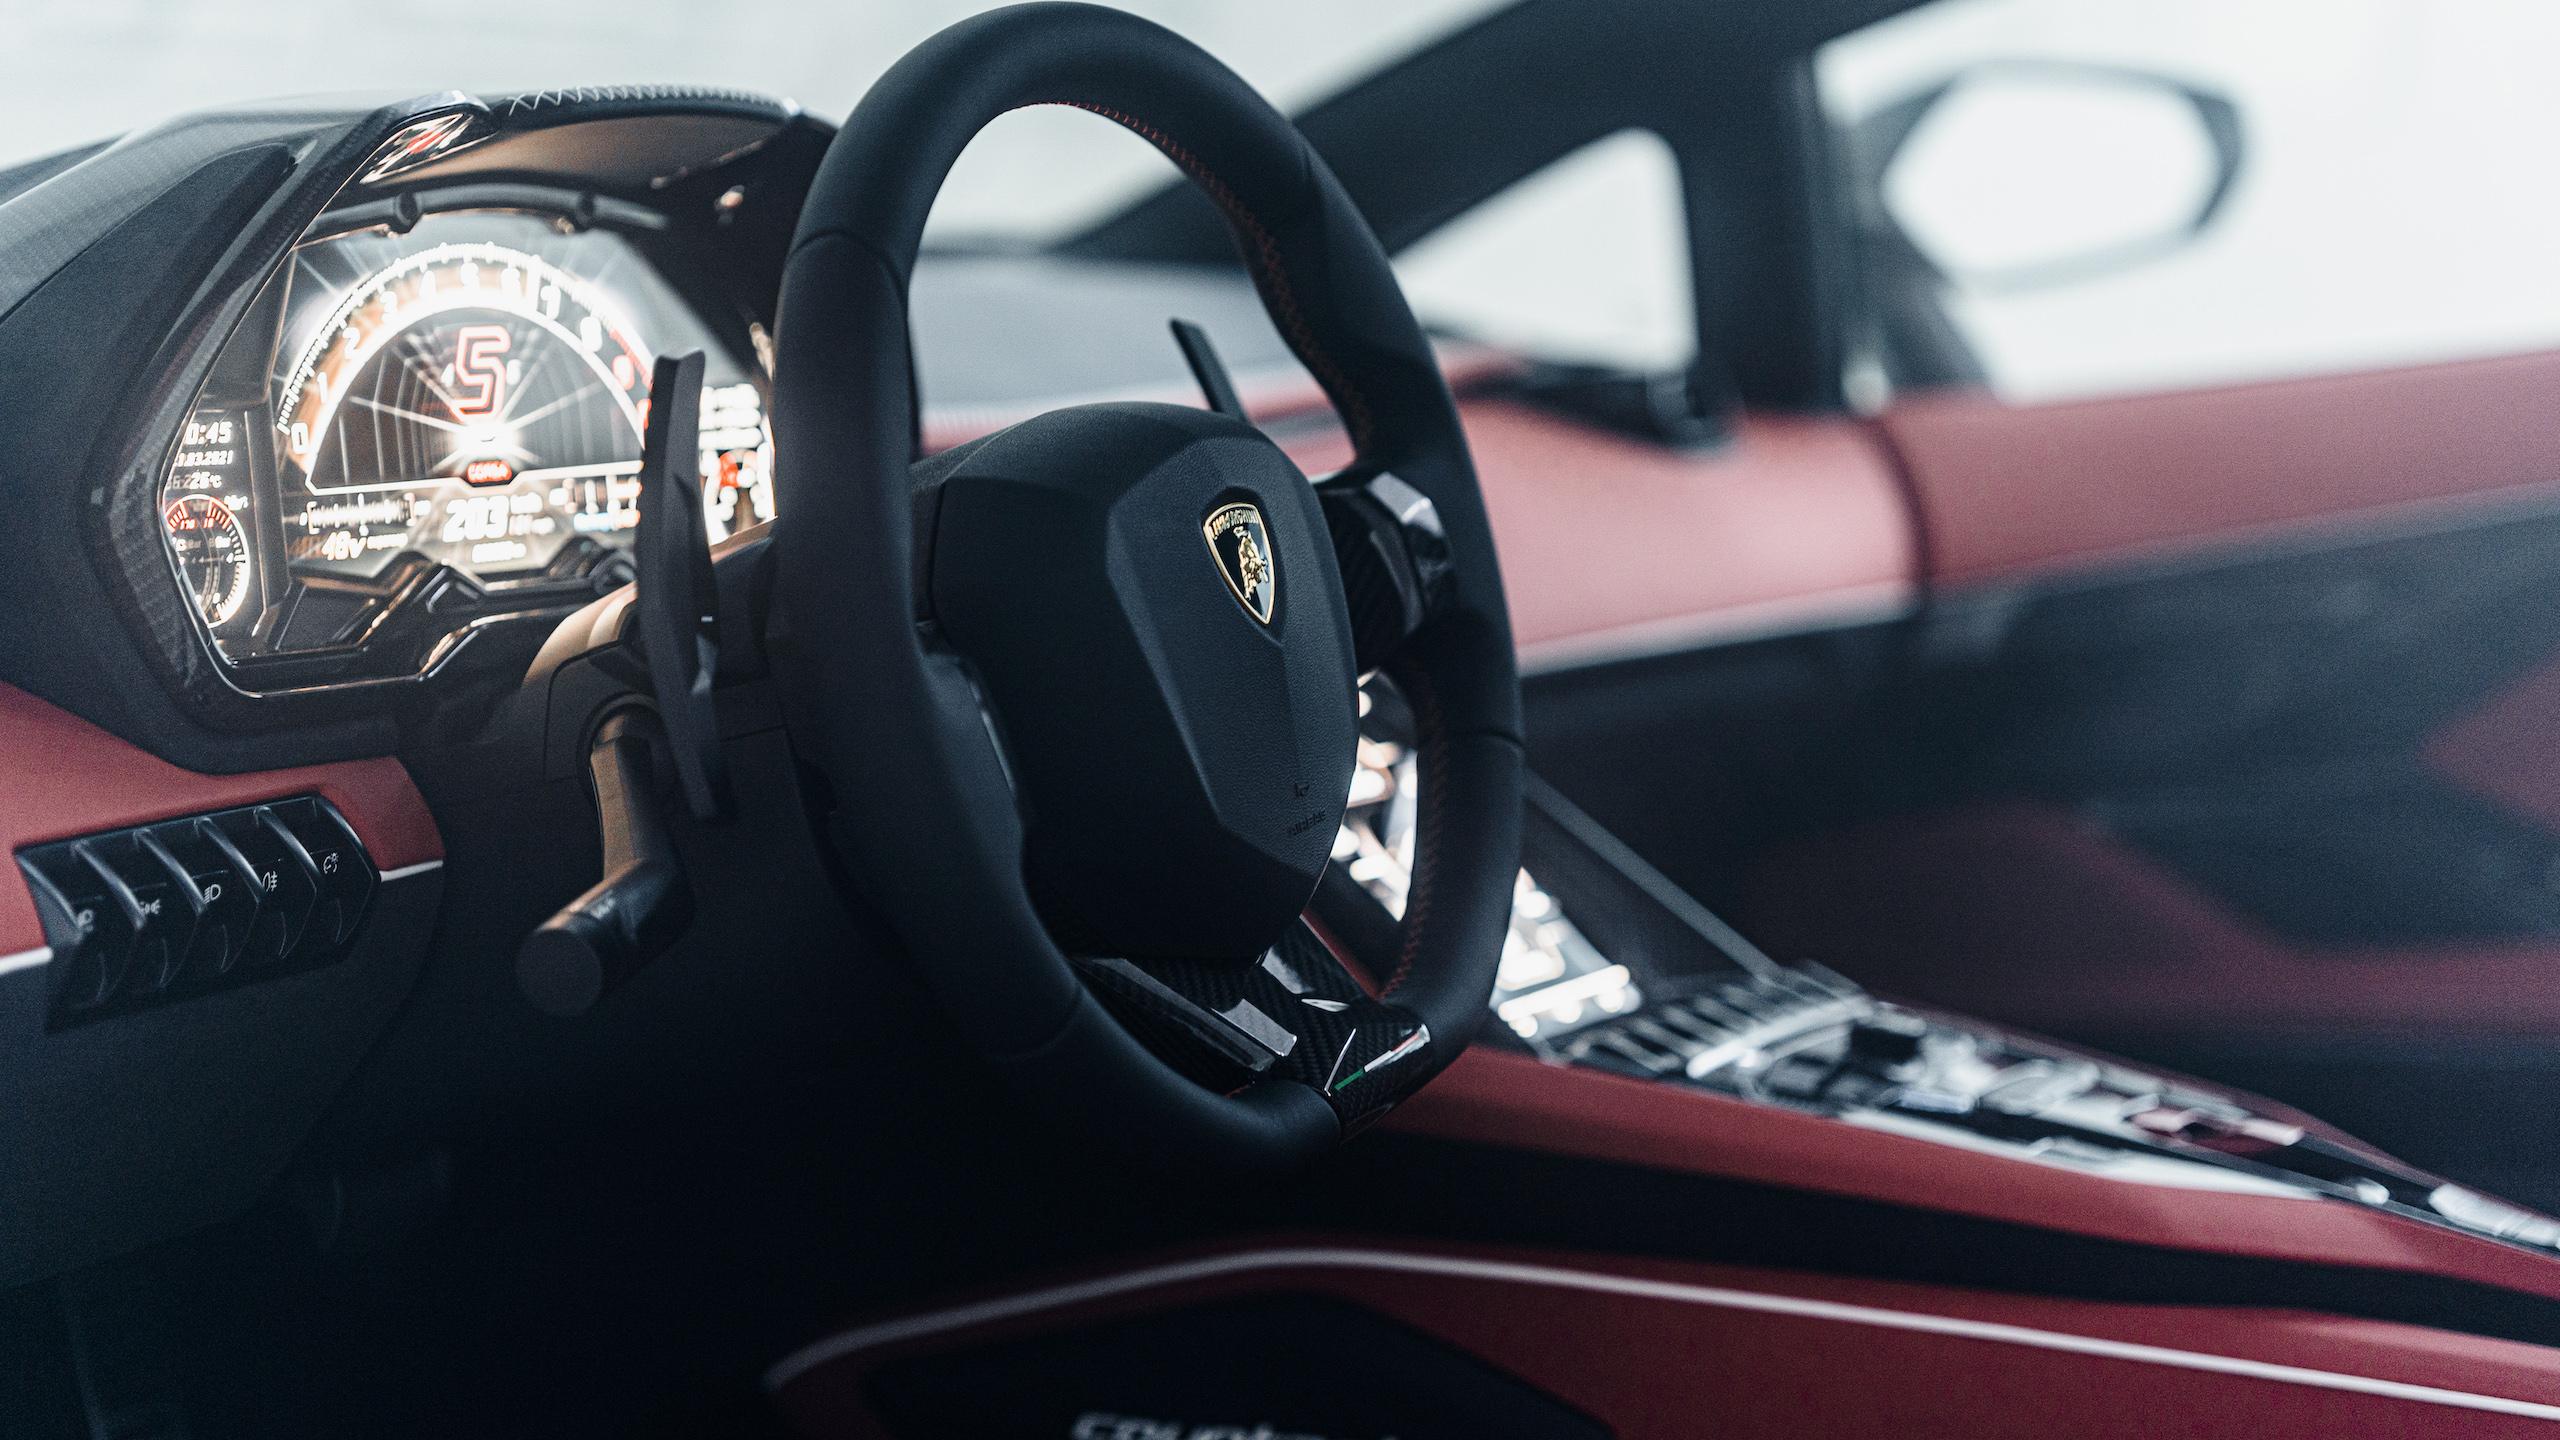 Countach LPI 800 interior steering wheel